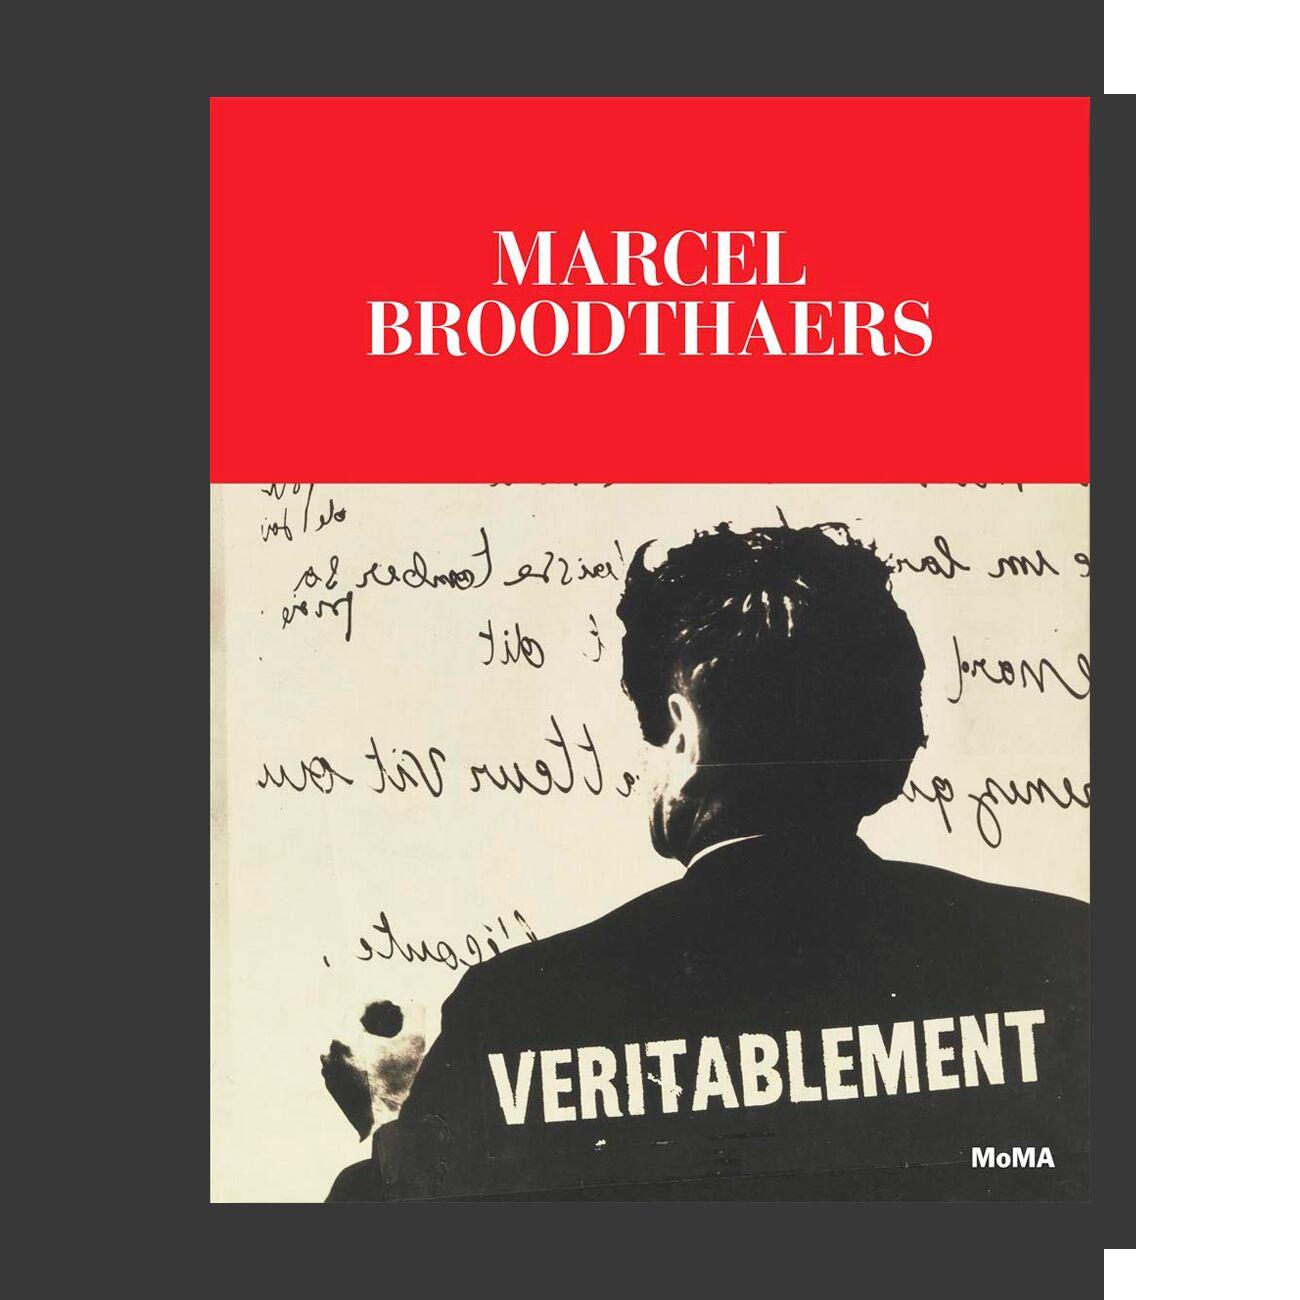 Marcel Broodthaers: A Retrospective